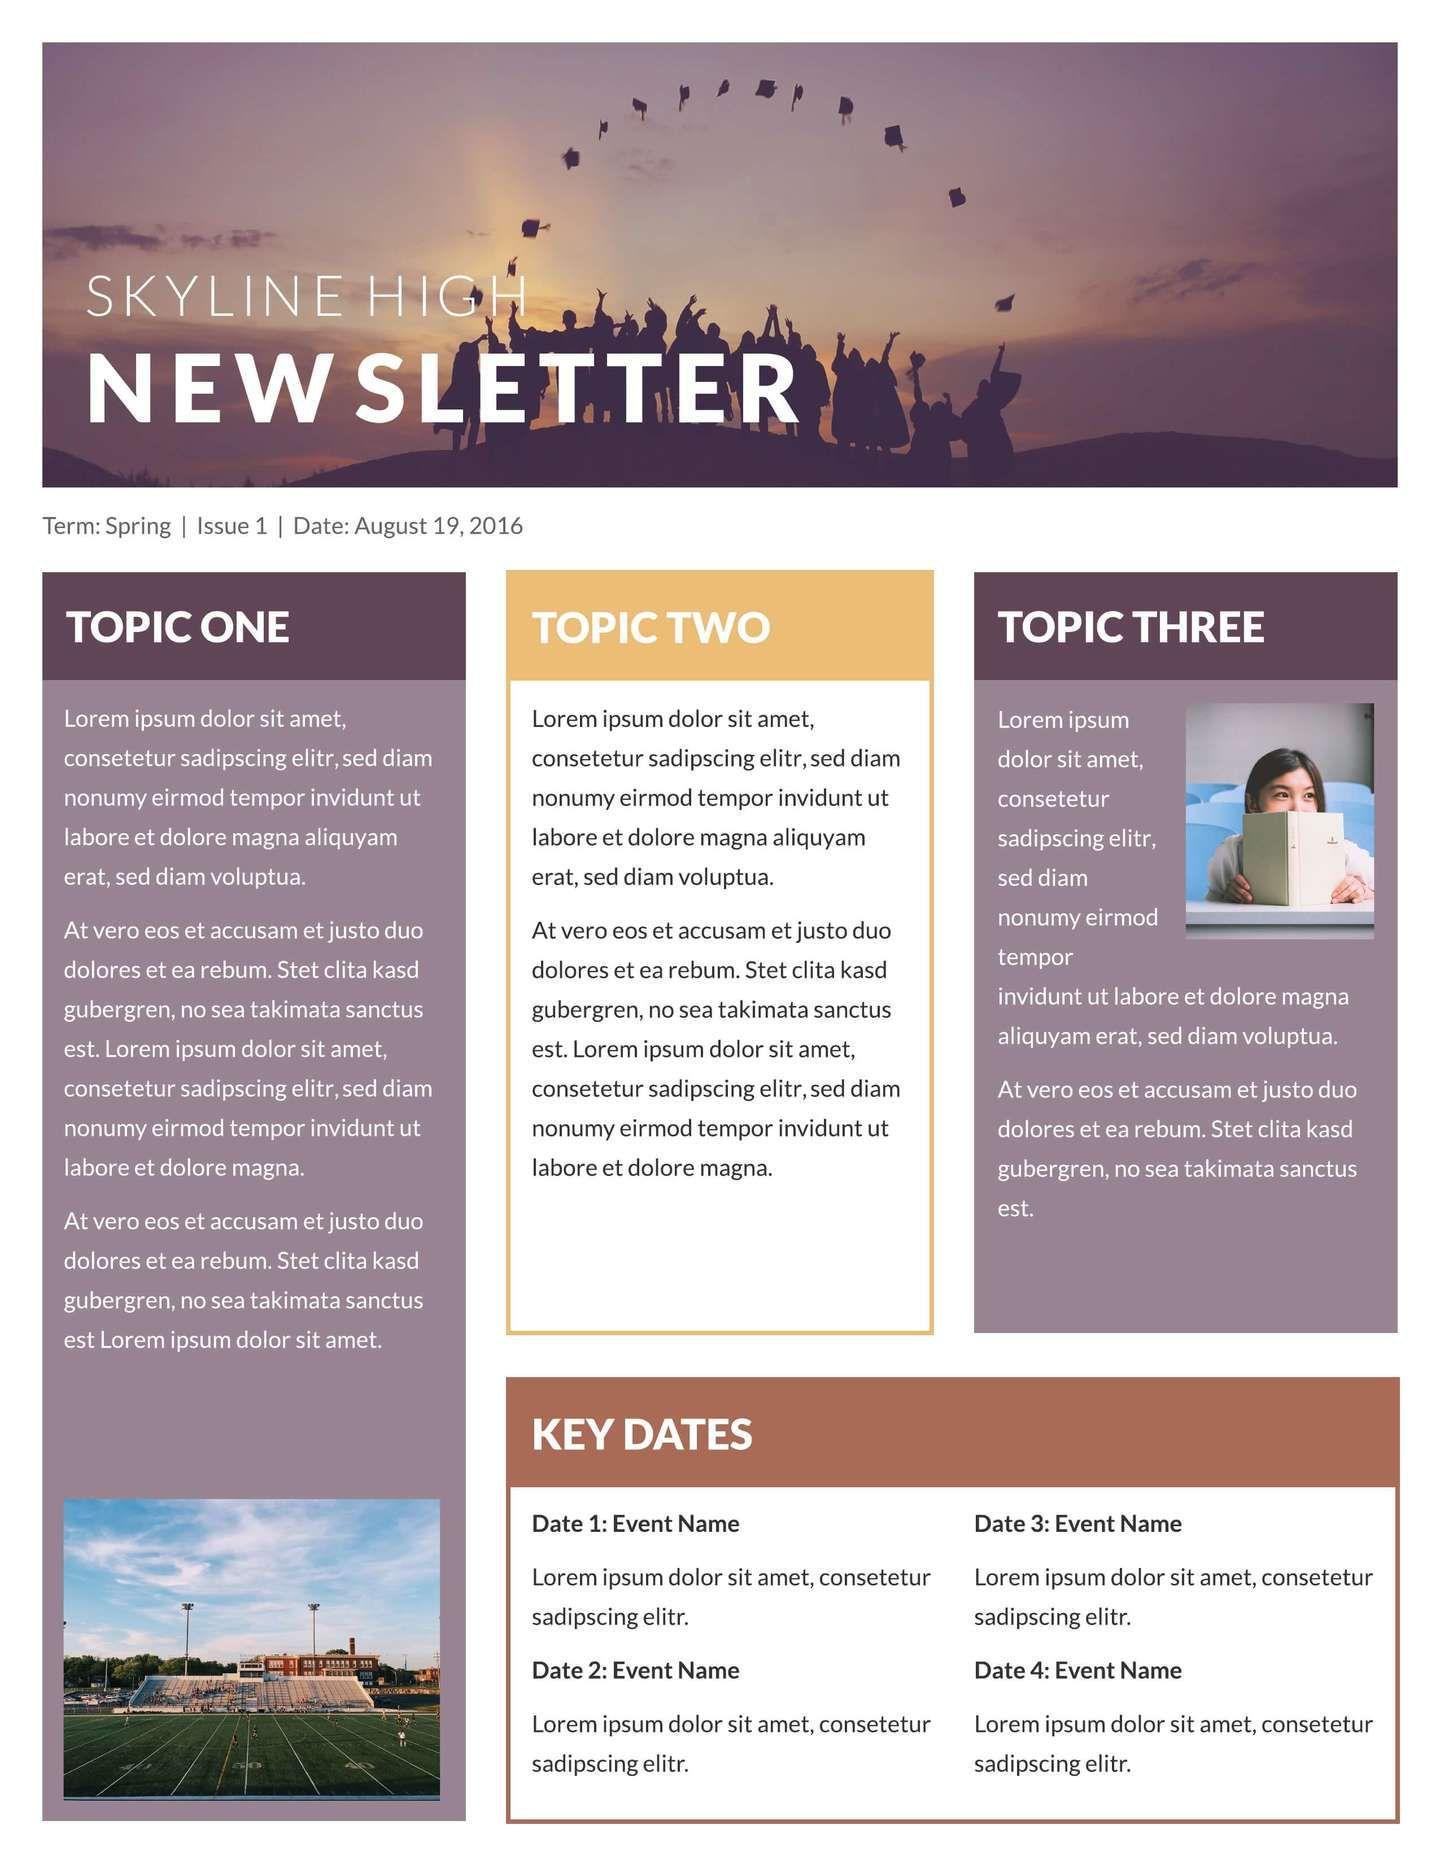 004 Singular Free Printable Newsletter Template High Def  Templates For Church PreschoolFull